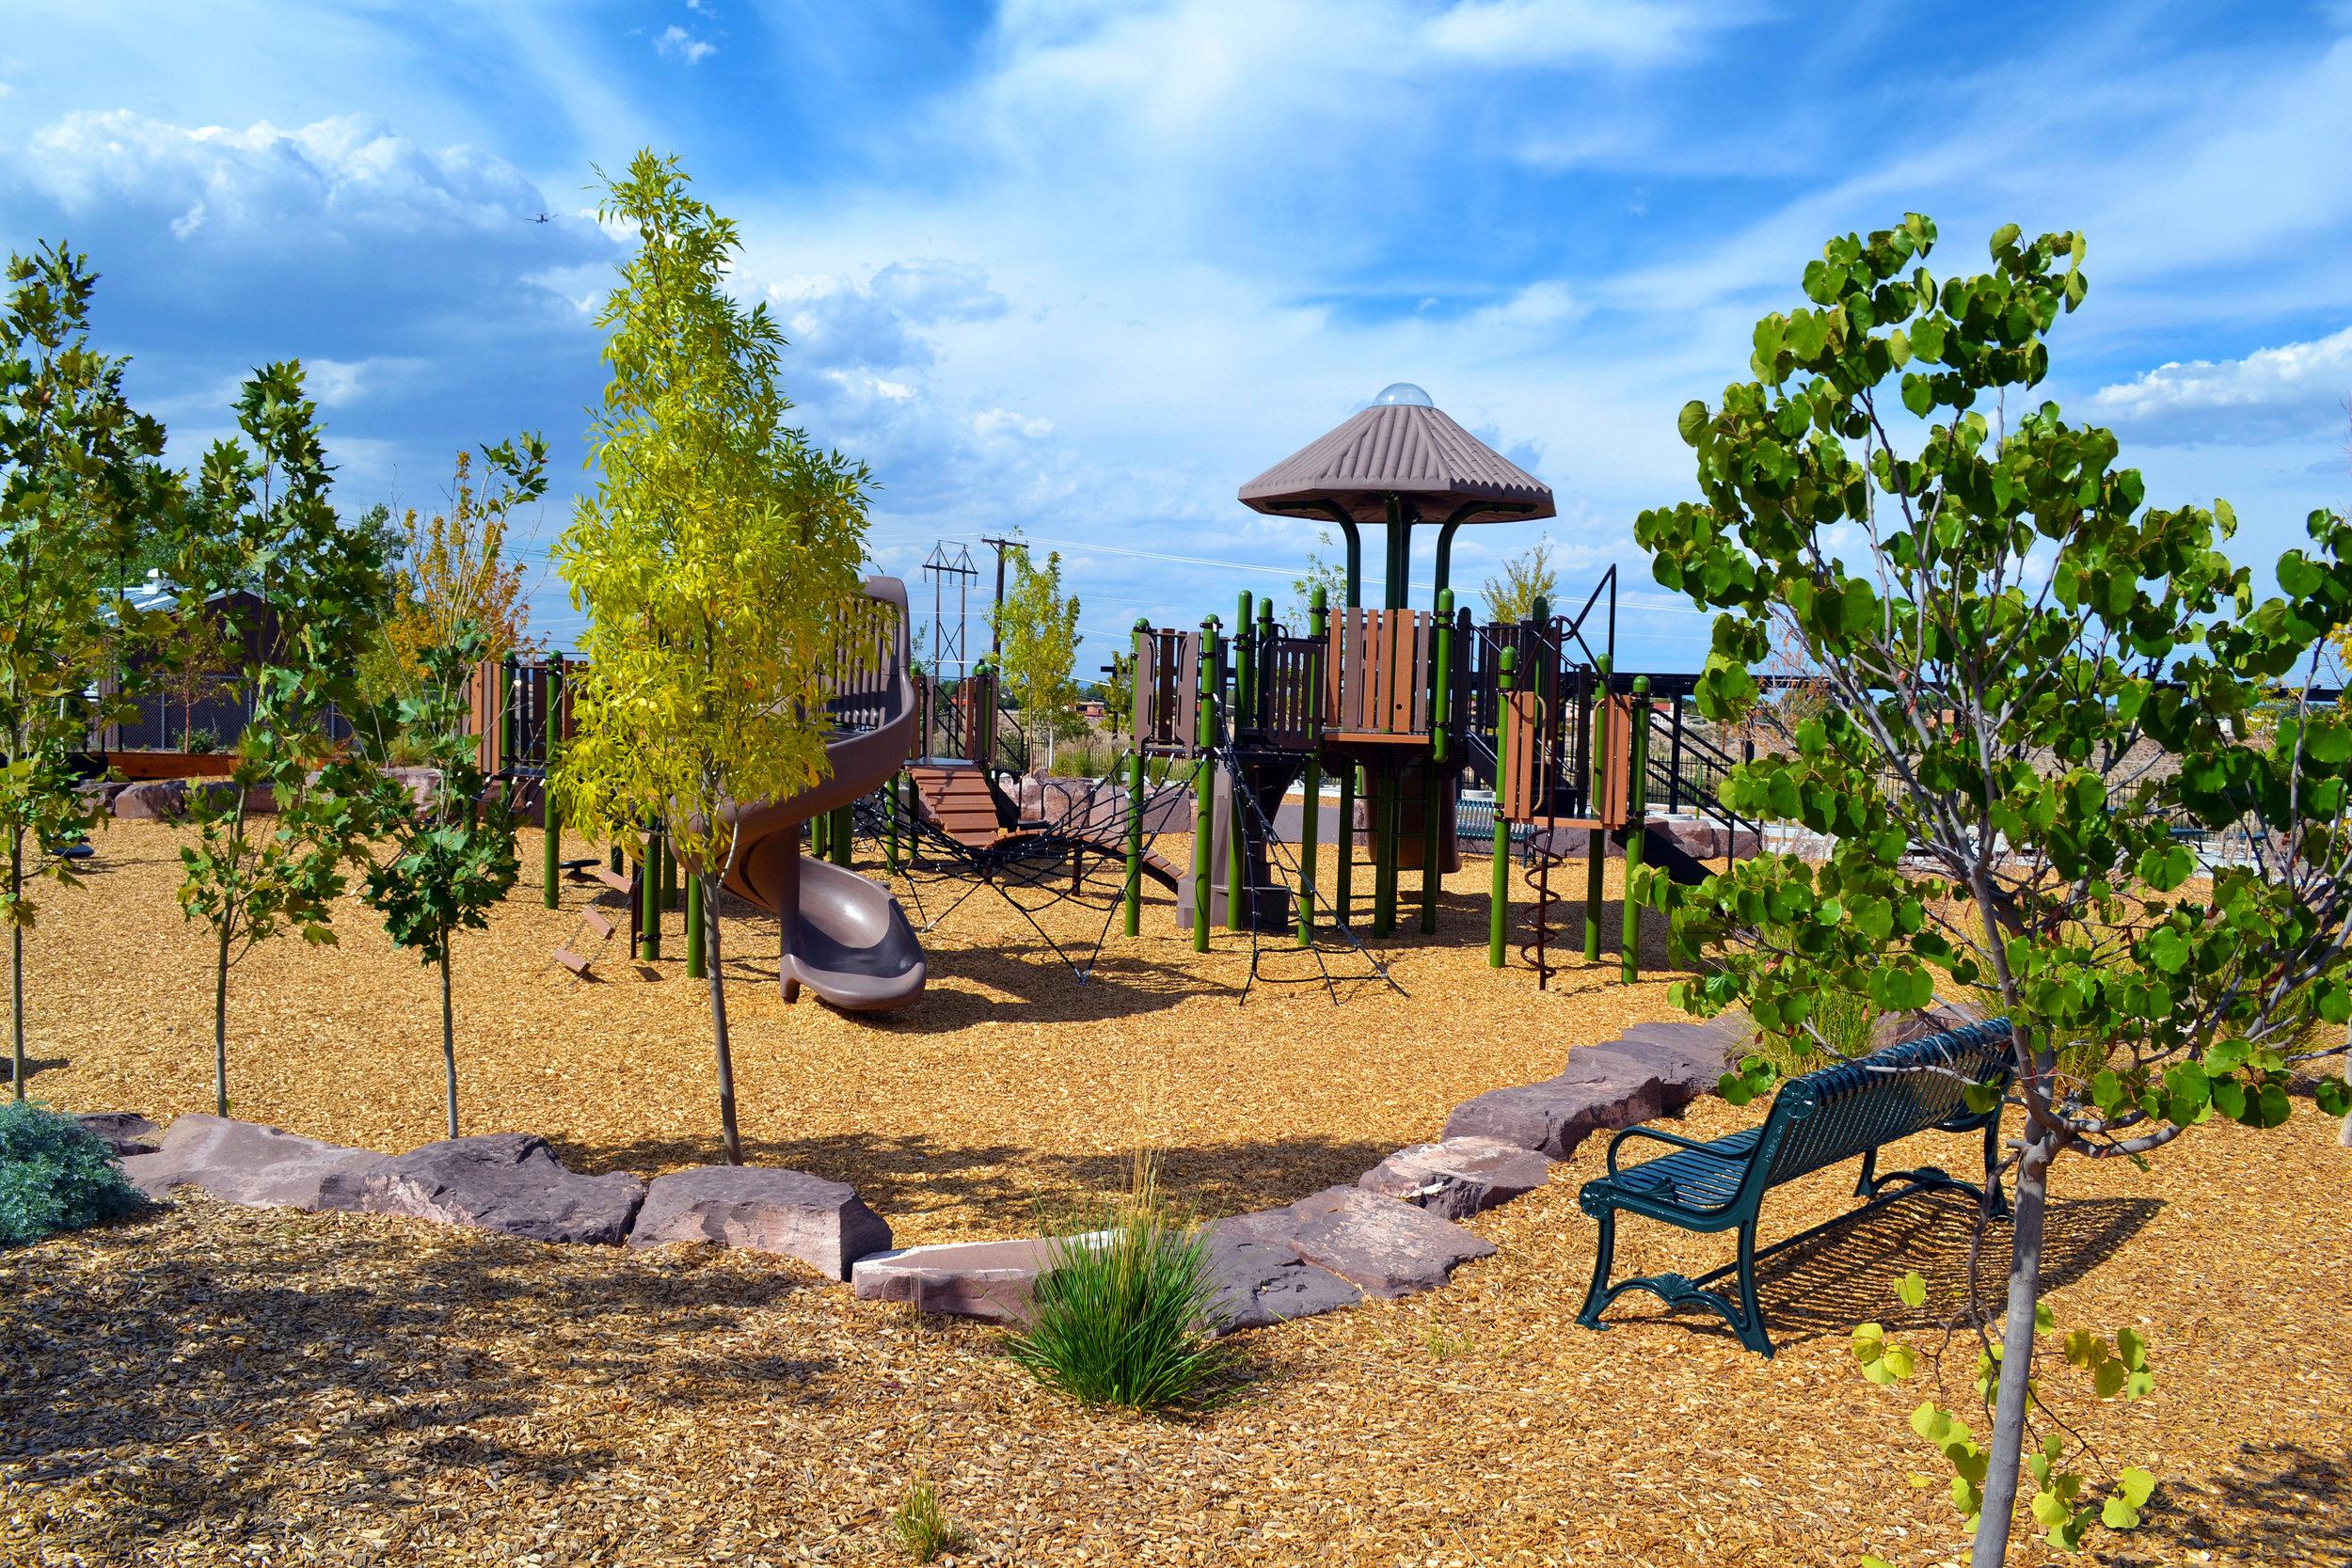 4 Four Hills Village Park, Albuquerque NM -  elevated play structure